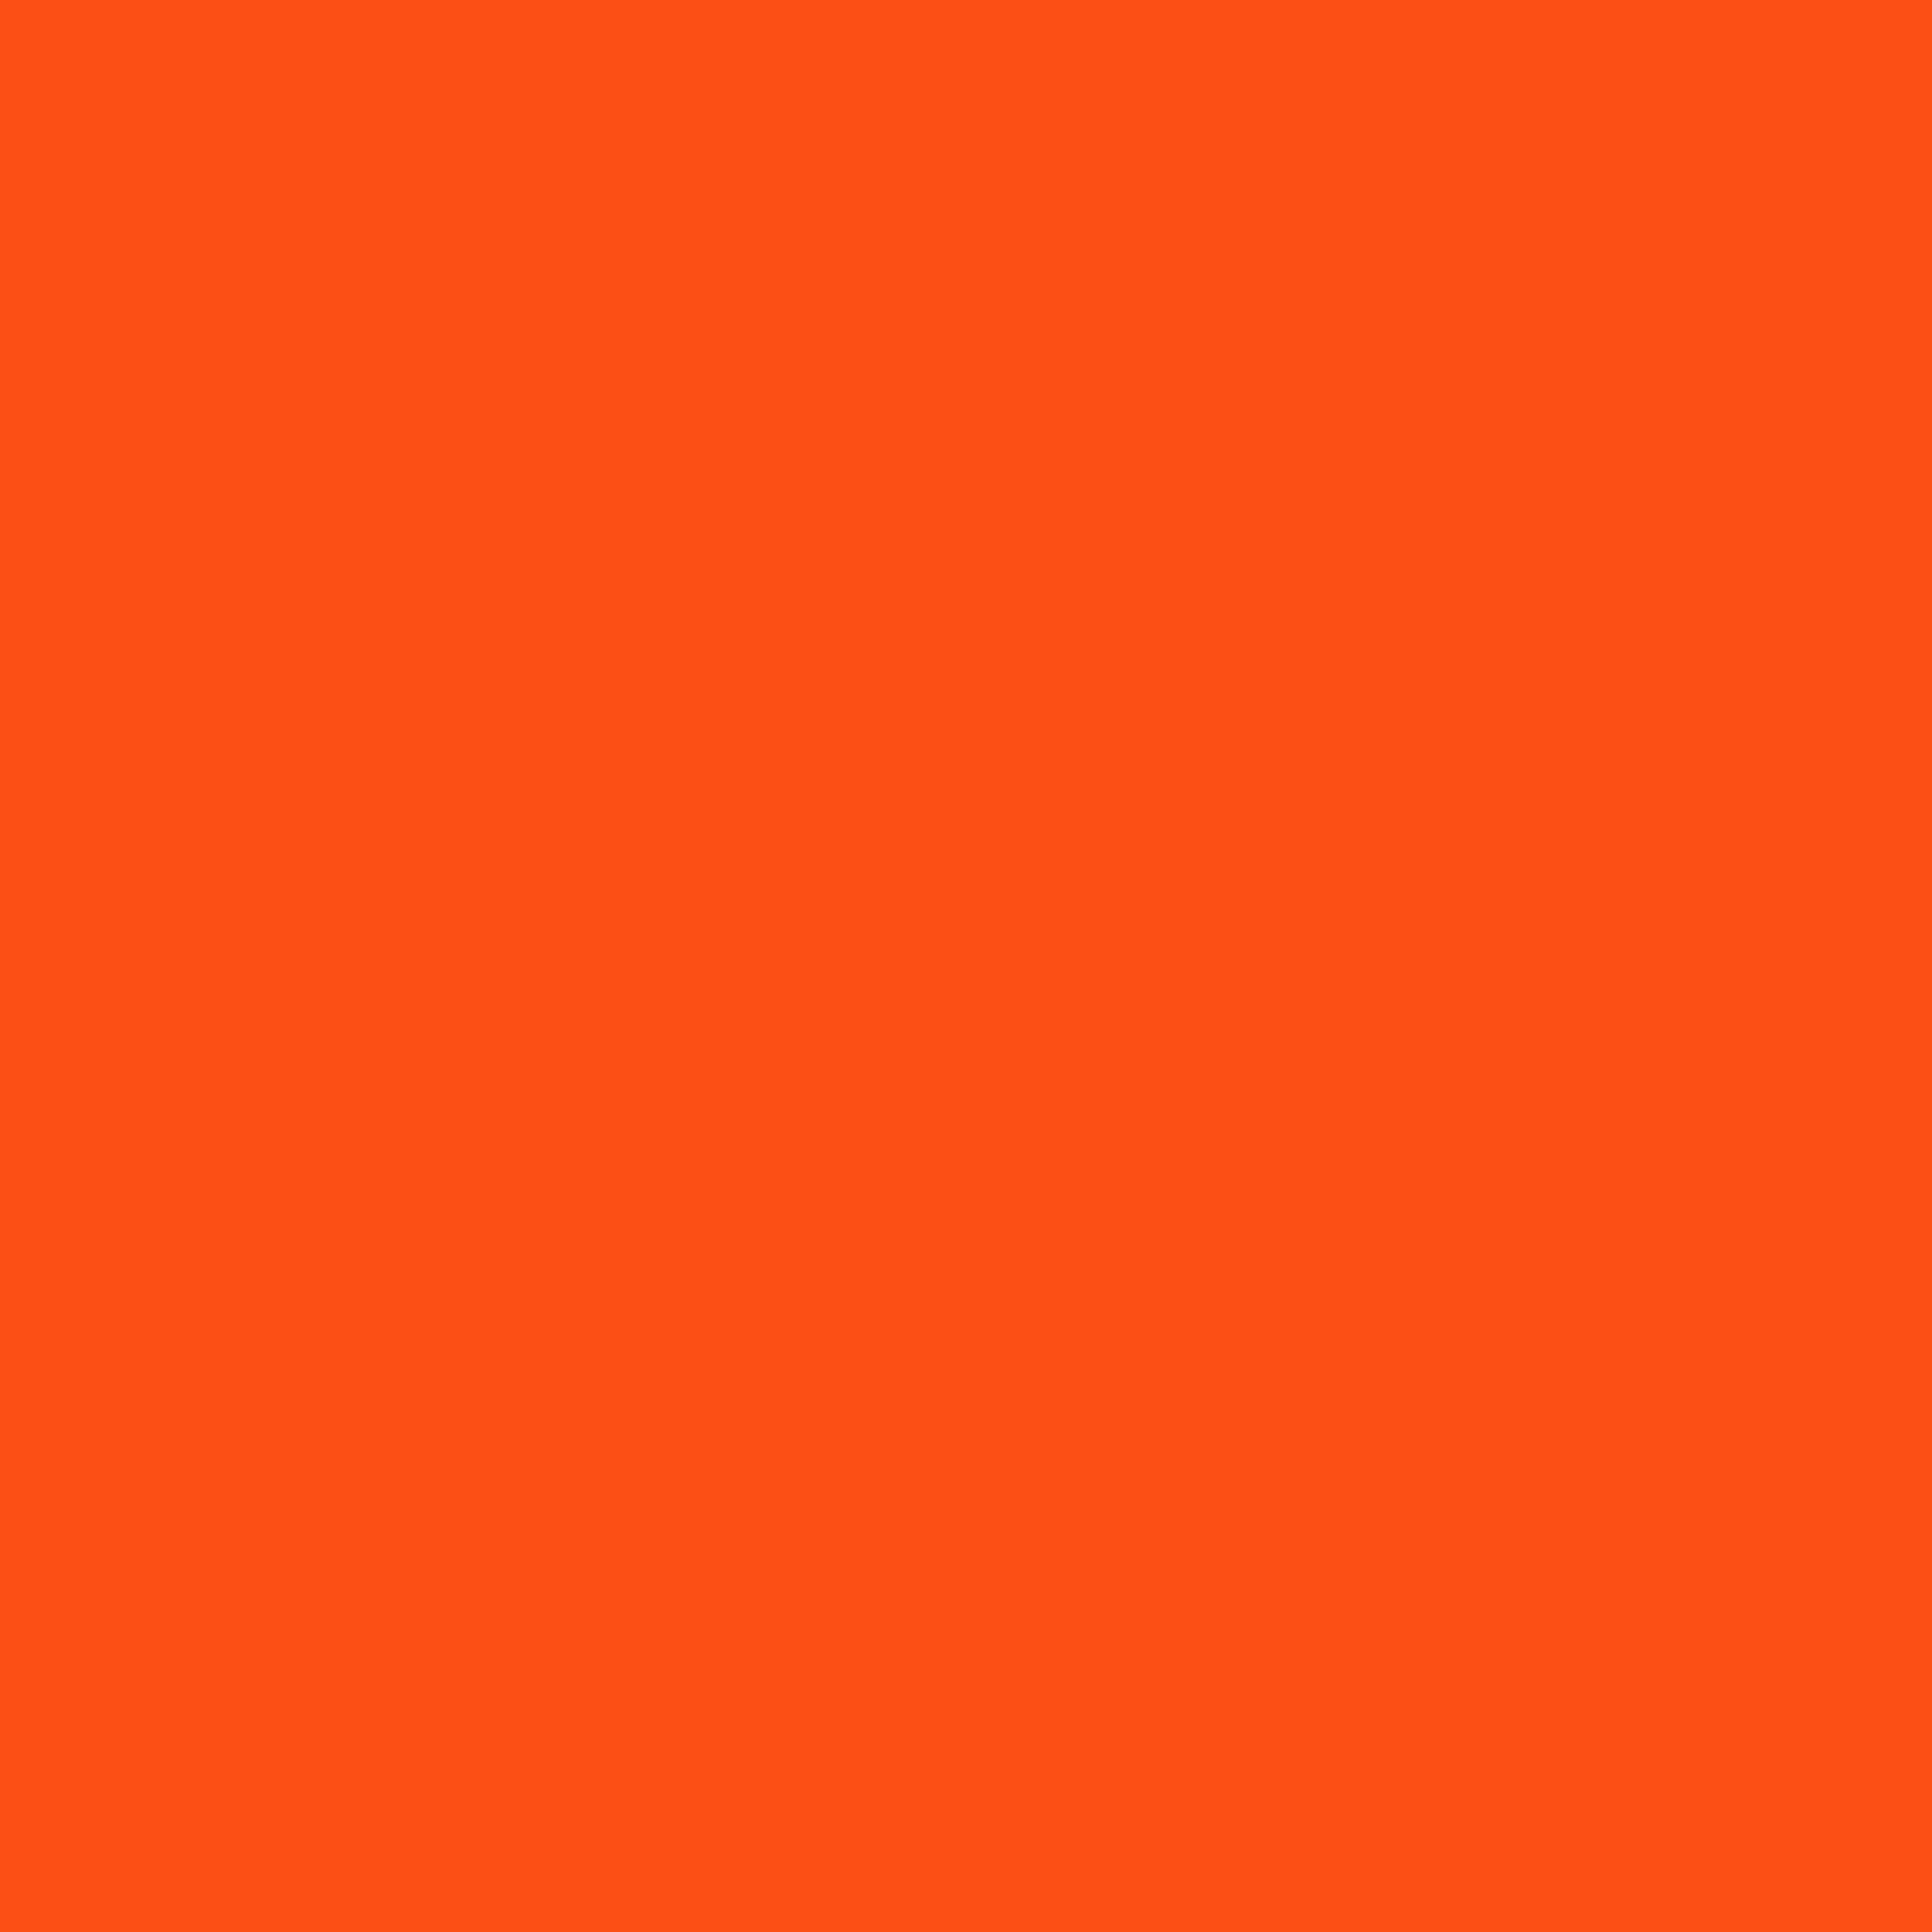 3600x3600 Orioles Orange Solid Color Background